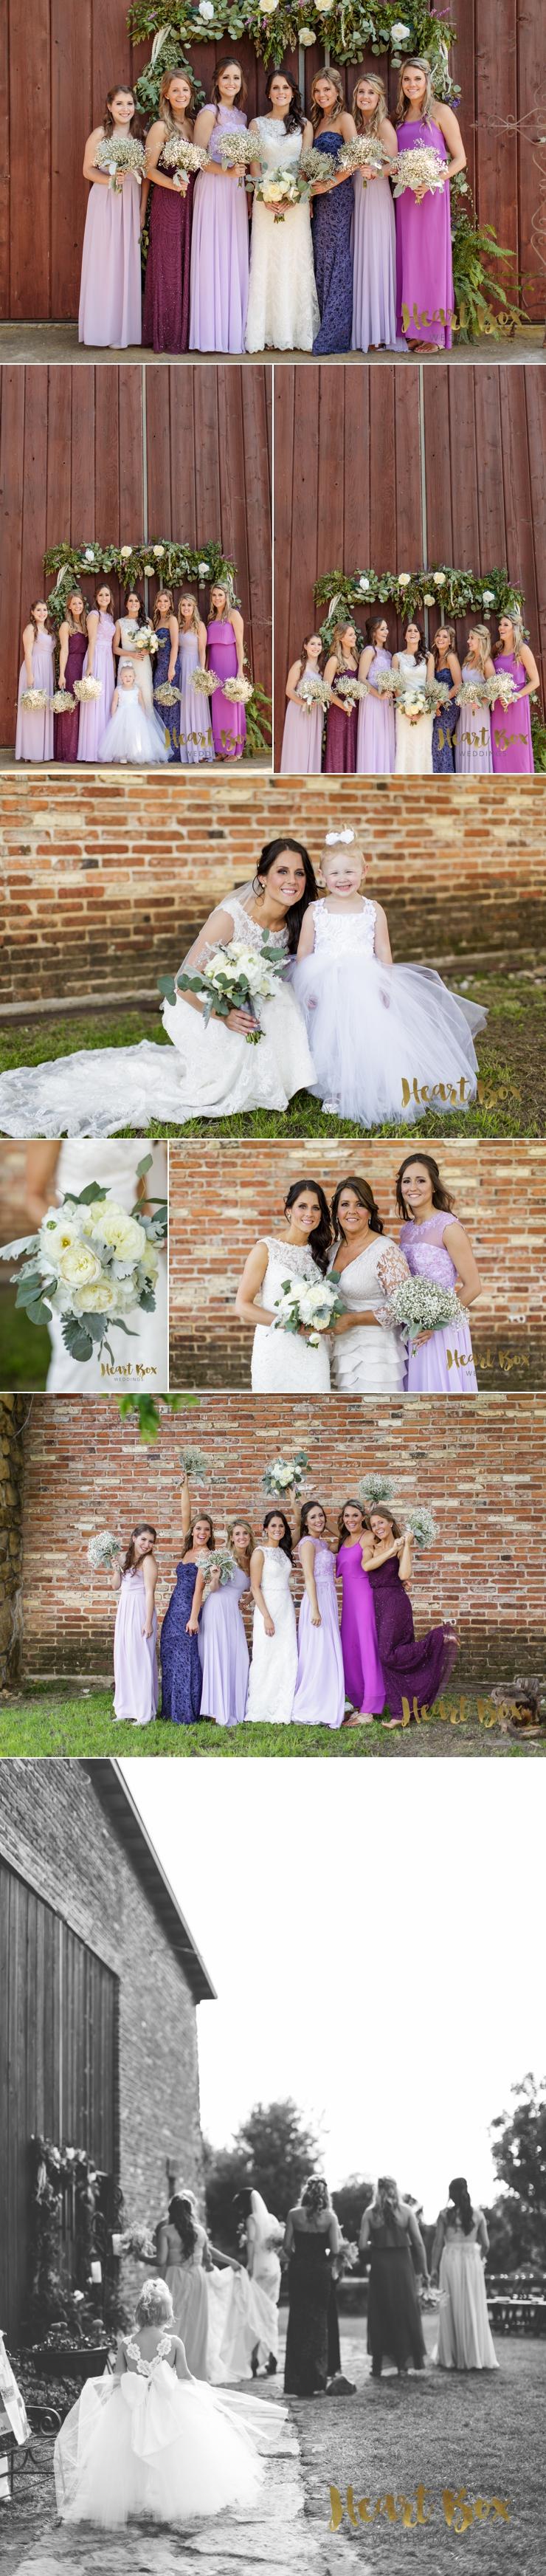 Thomas Wedding Blog Collages 3.jpg